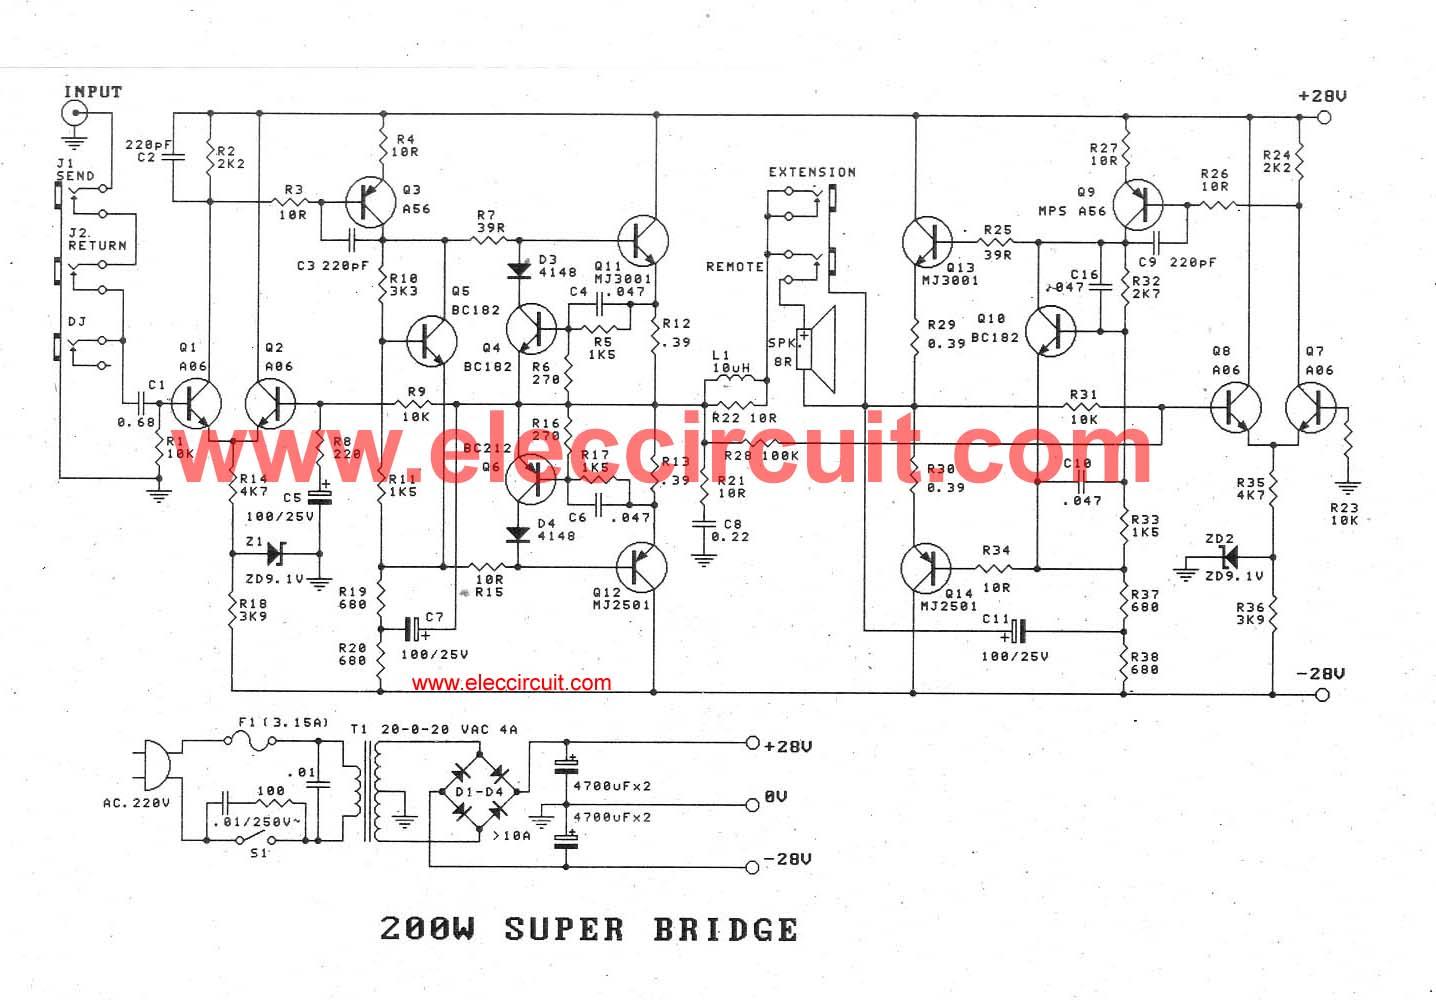 bass guitar amp circuit diagram